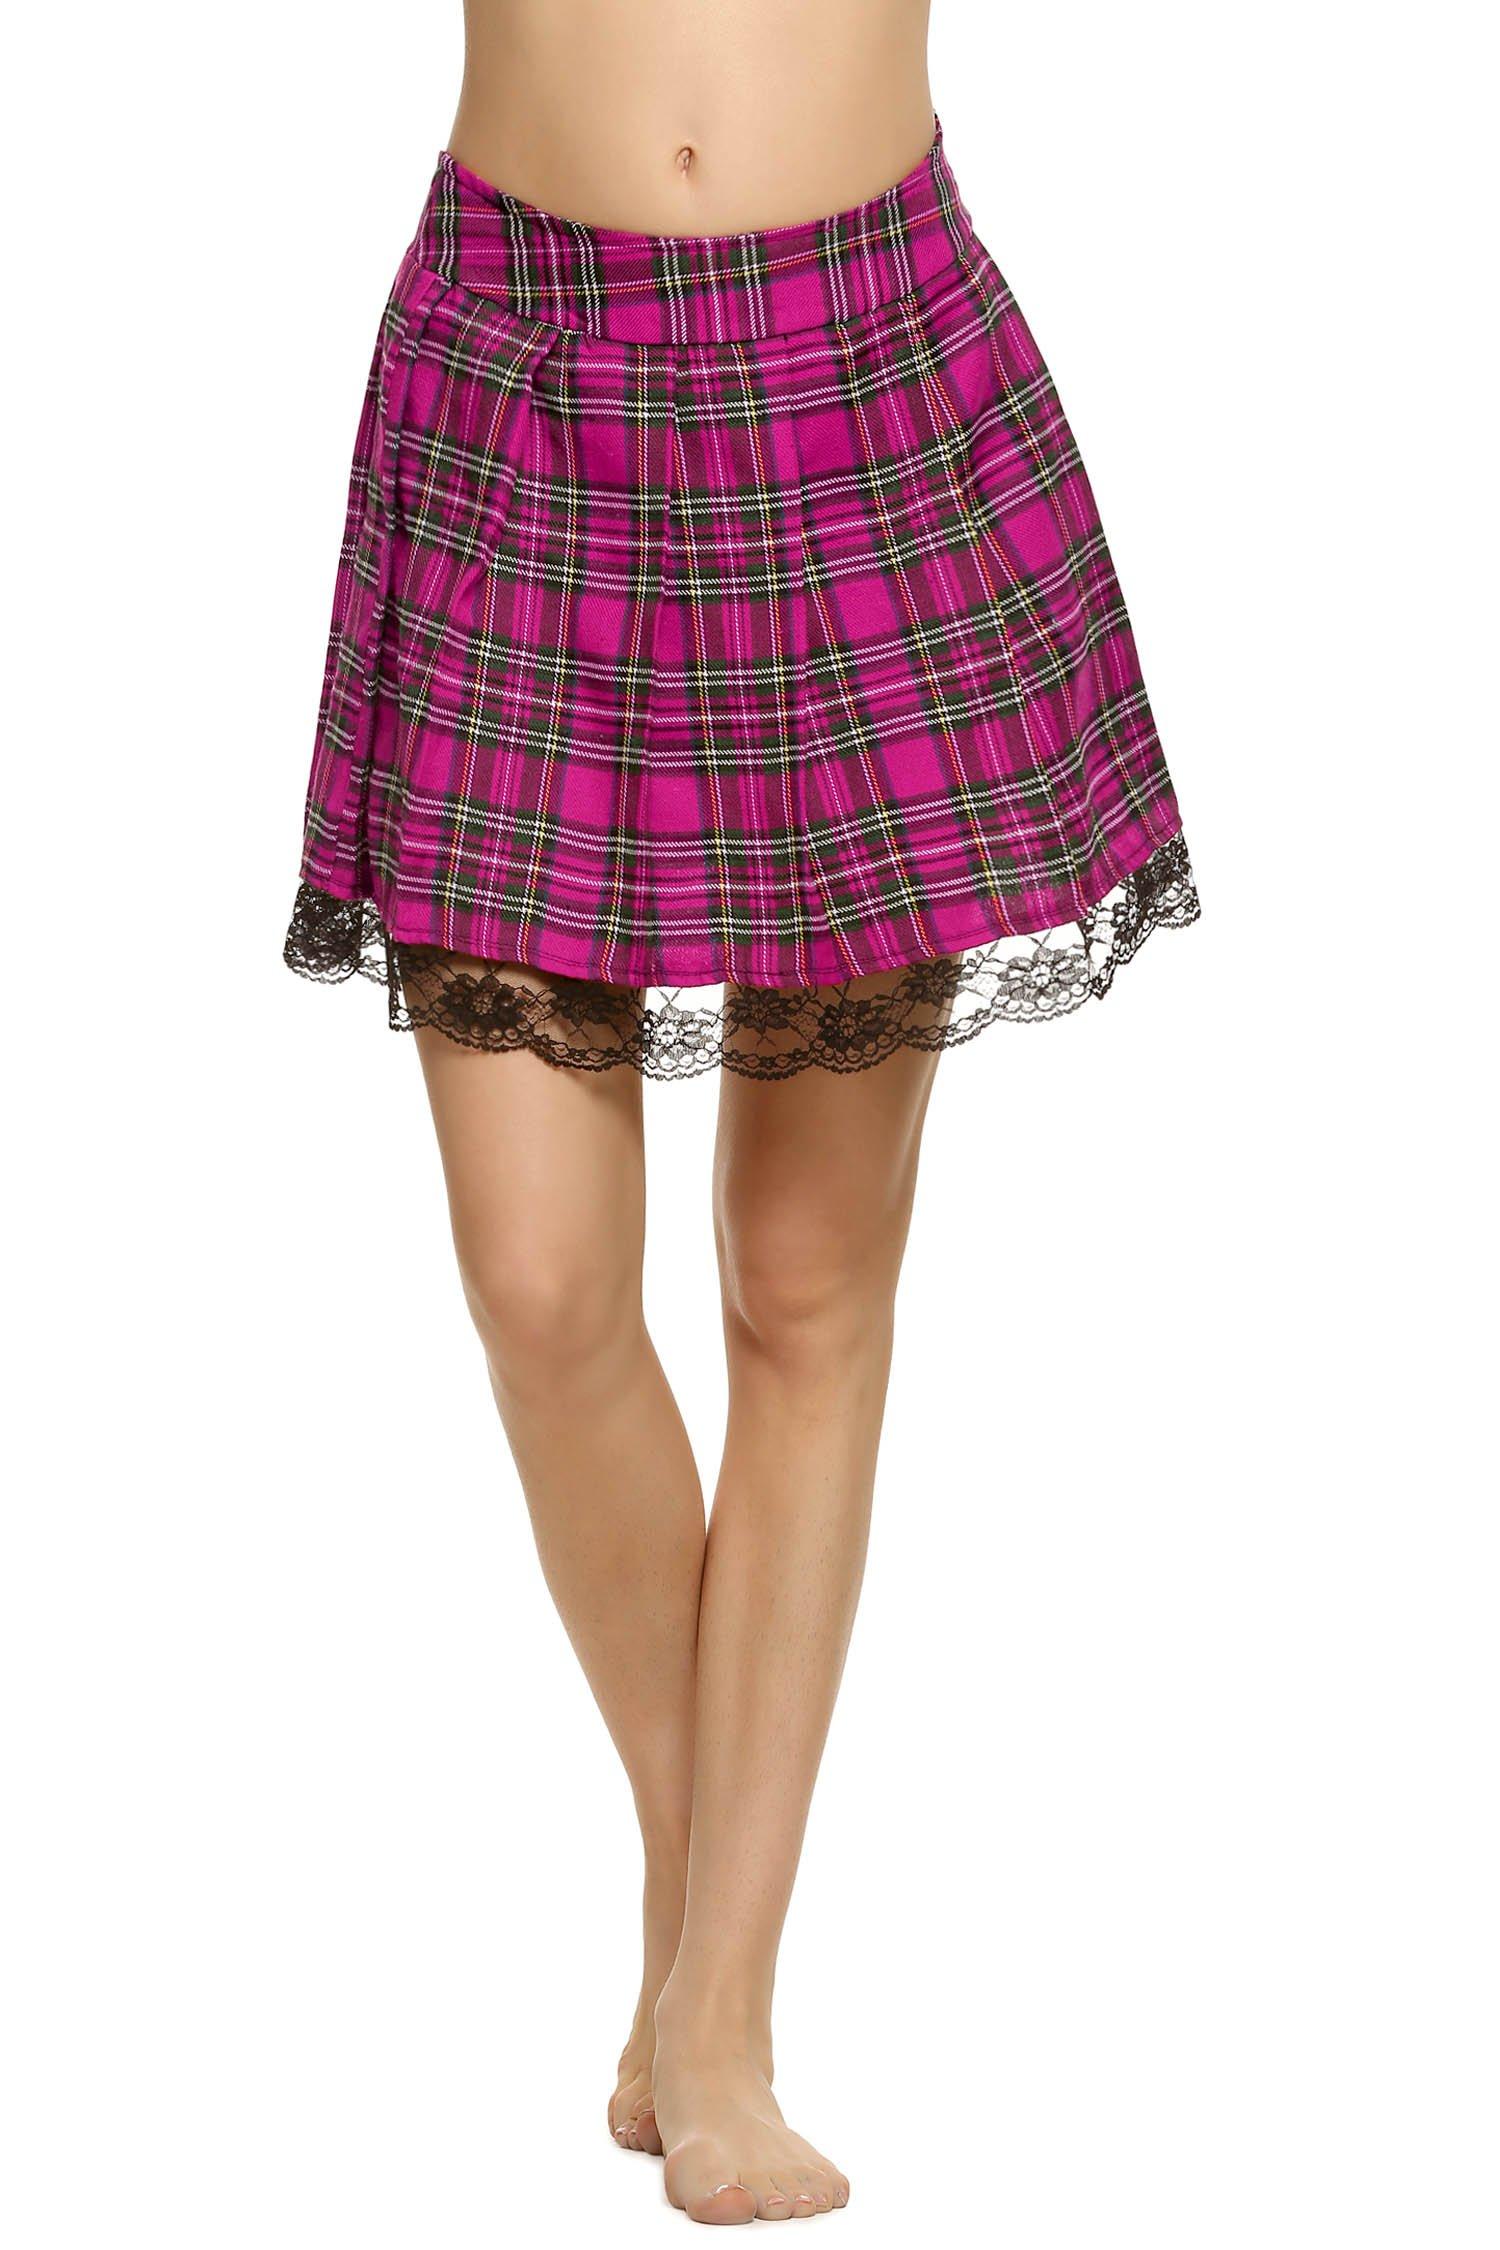 ELOVER Women Lingerie Skirt Role Play Costume Mini Plaid Skirt Schoolgirl Cosplay Pleated Dress Rose Red S